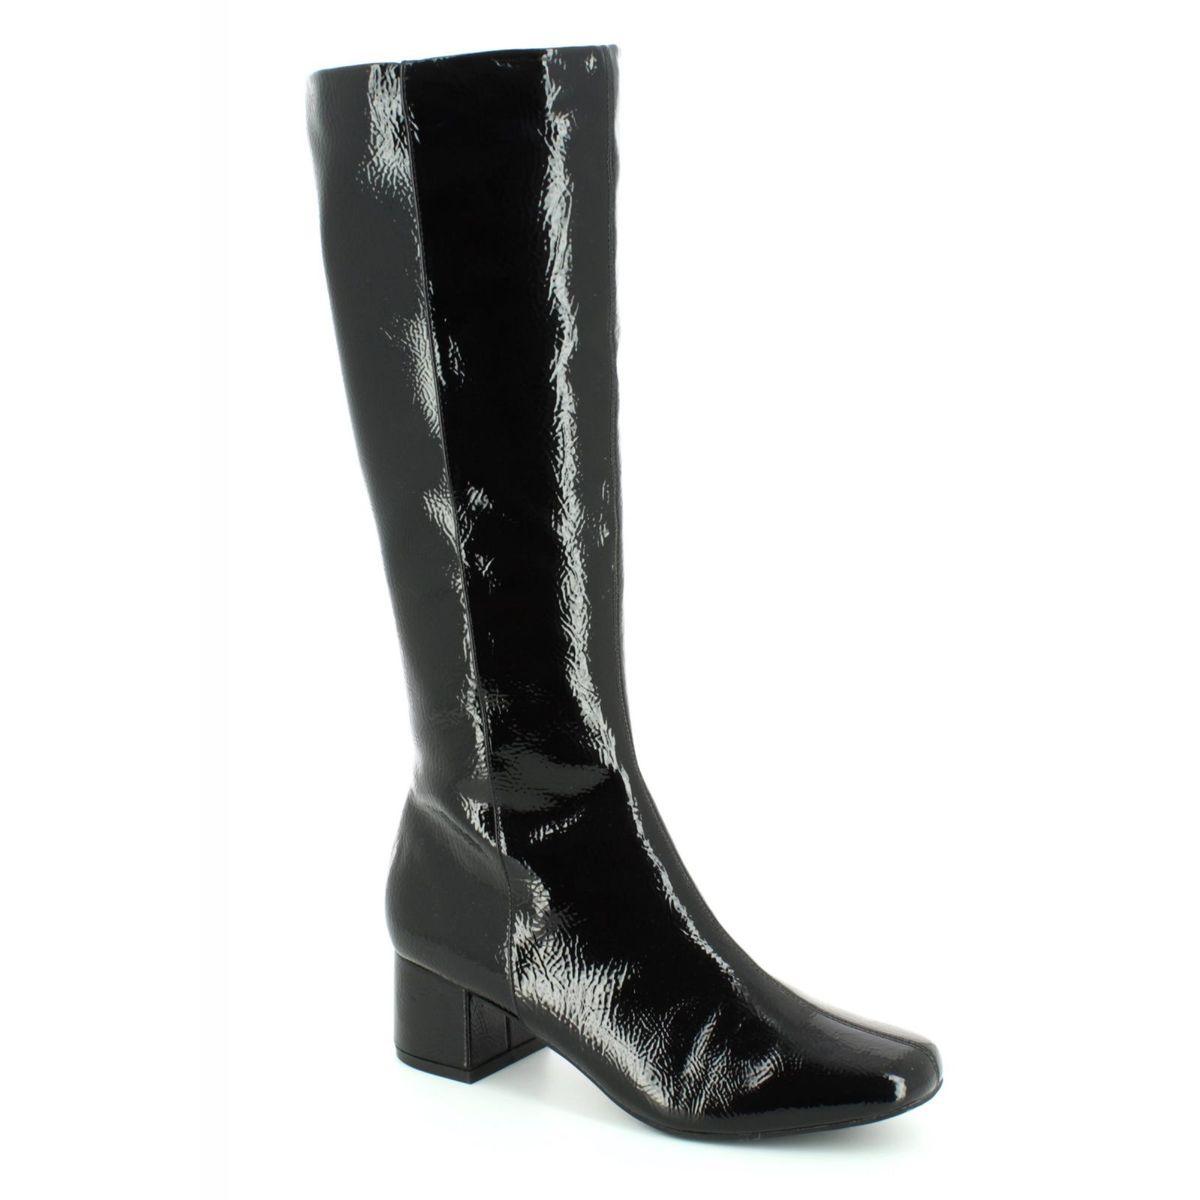 c37927f0cdb6 Lotus Knee-high Boots - Black patent - 40414 40 VEZALLI